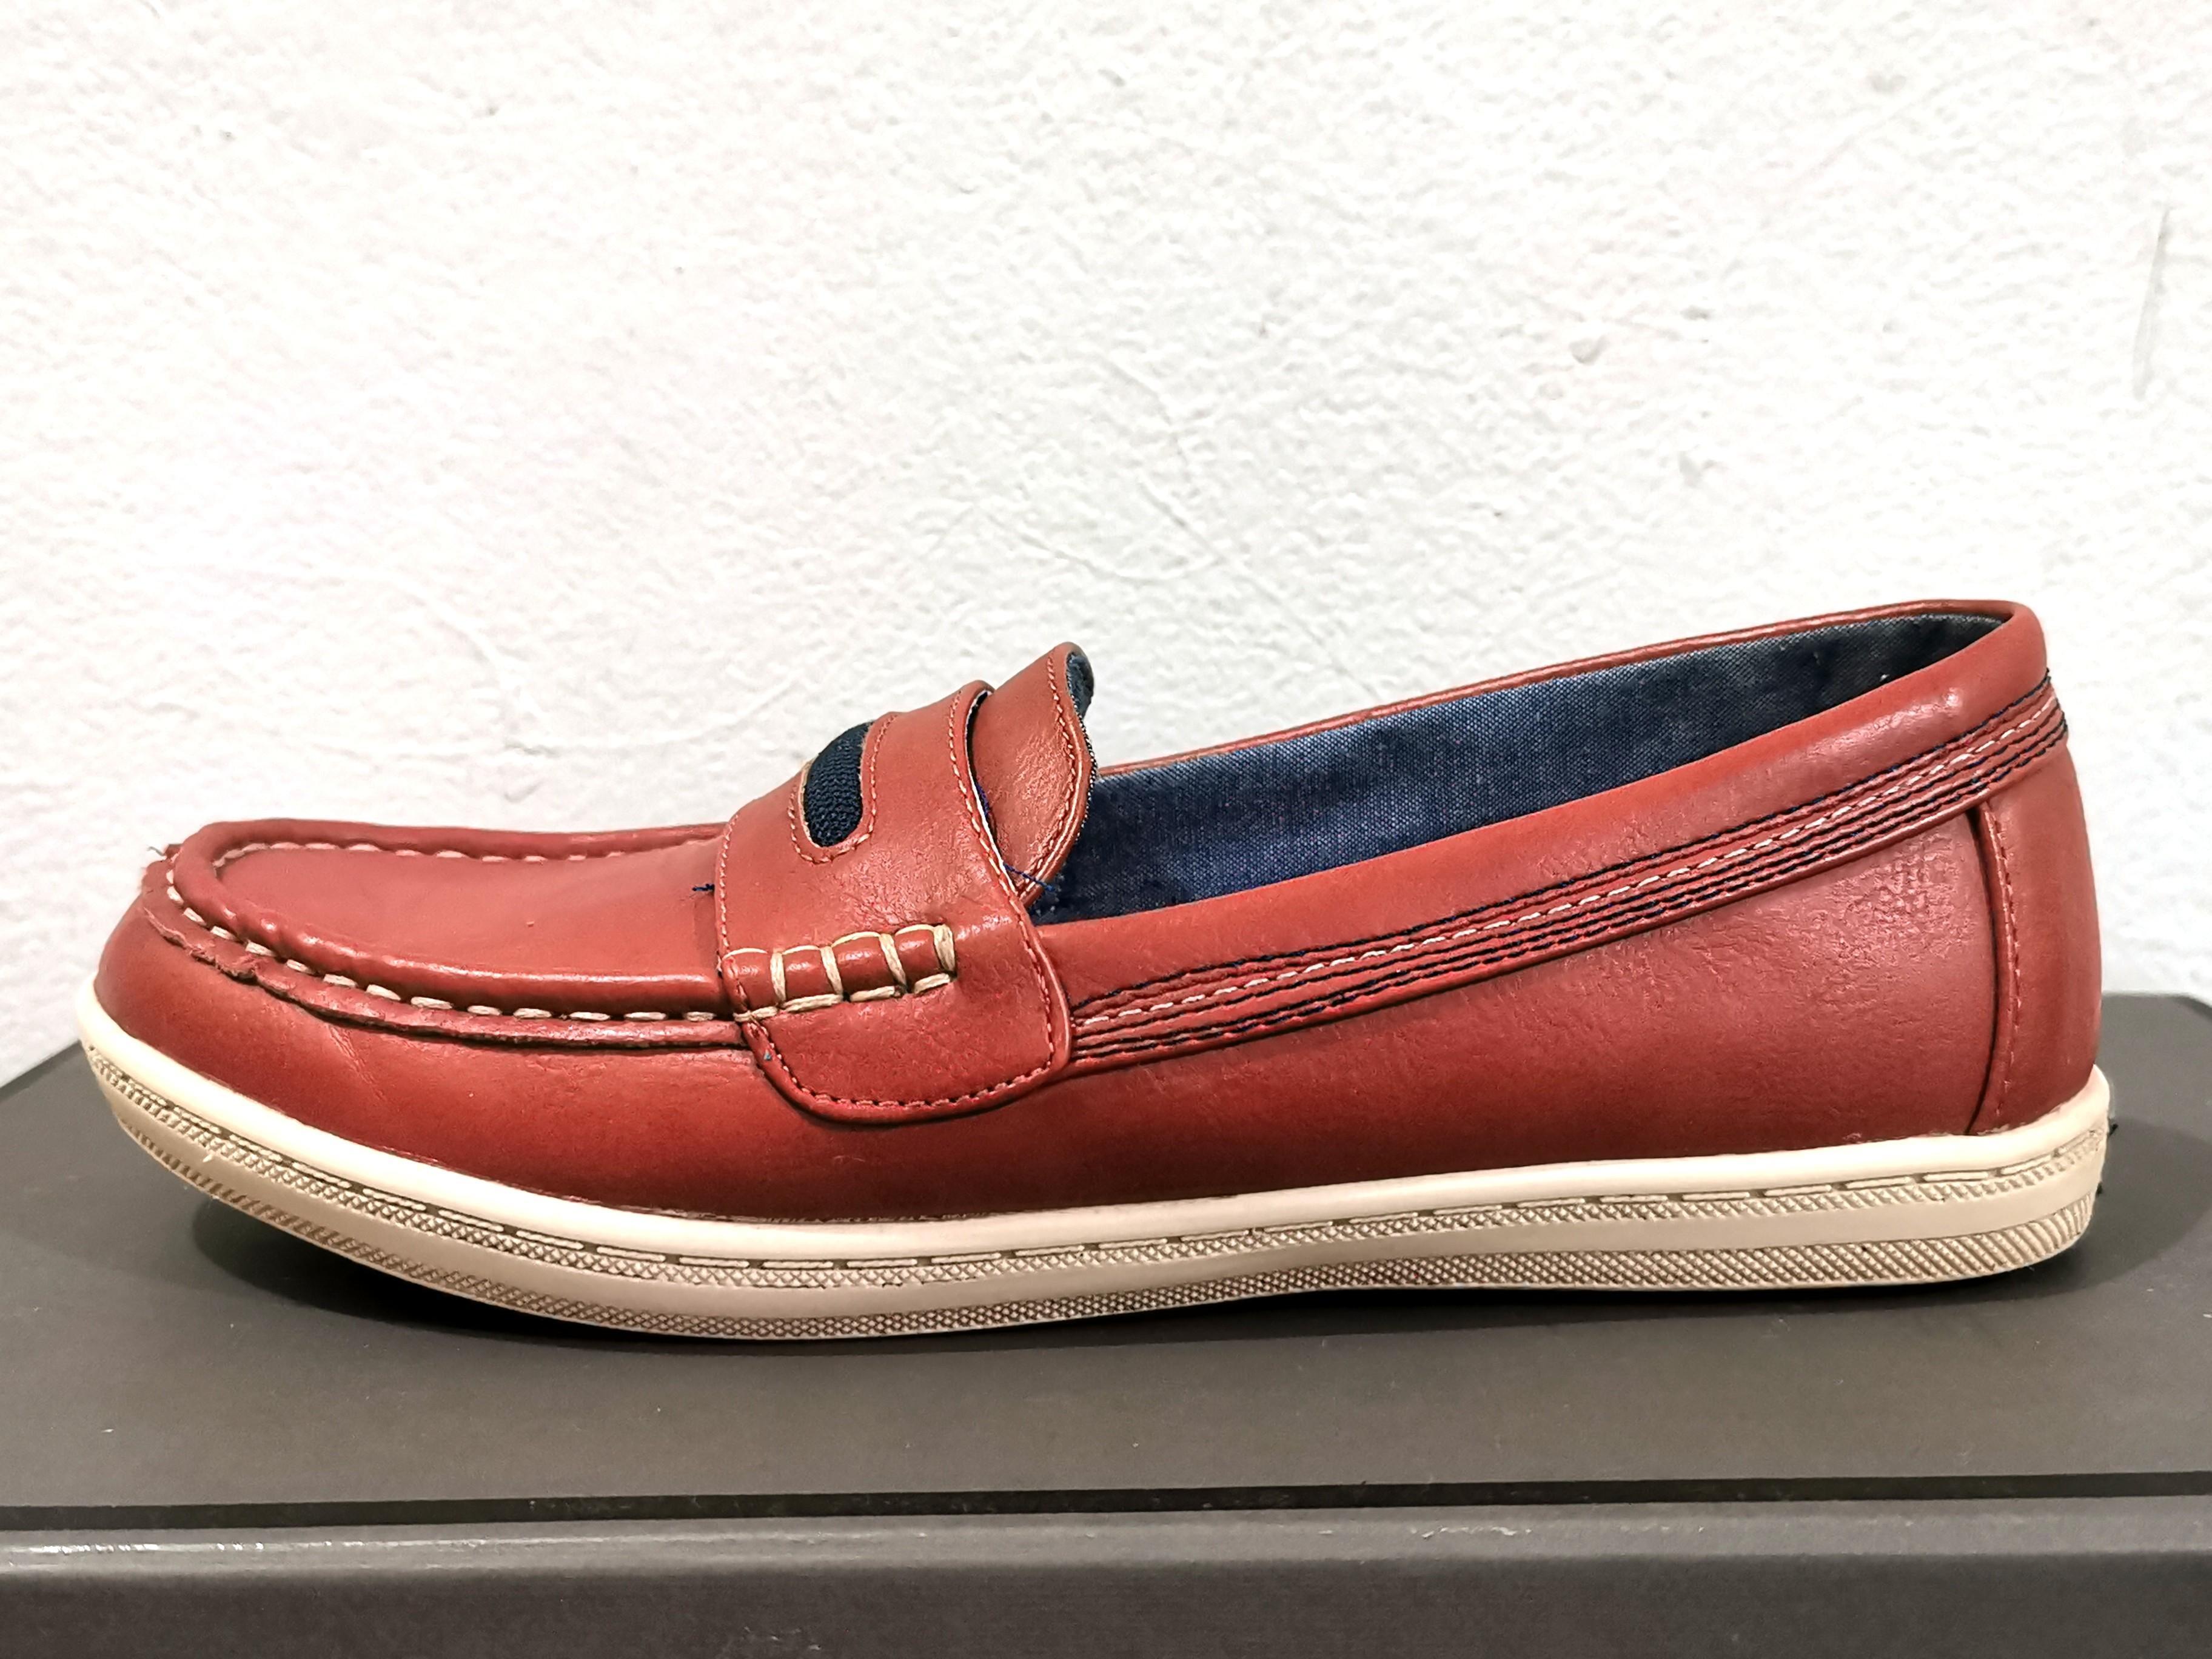 #OctoberSale Sepatu anak Tommy Hilfiger